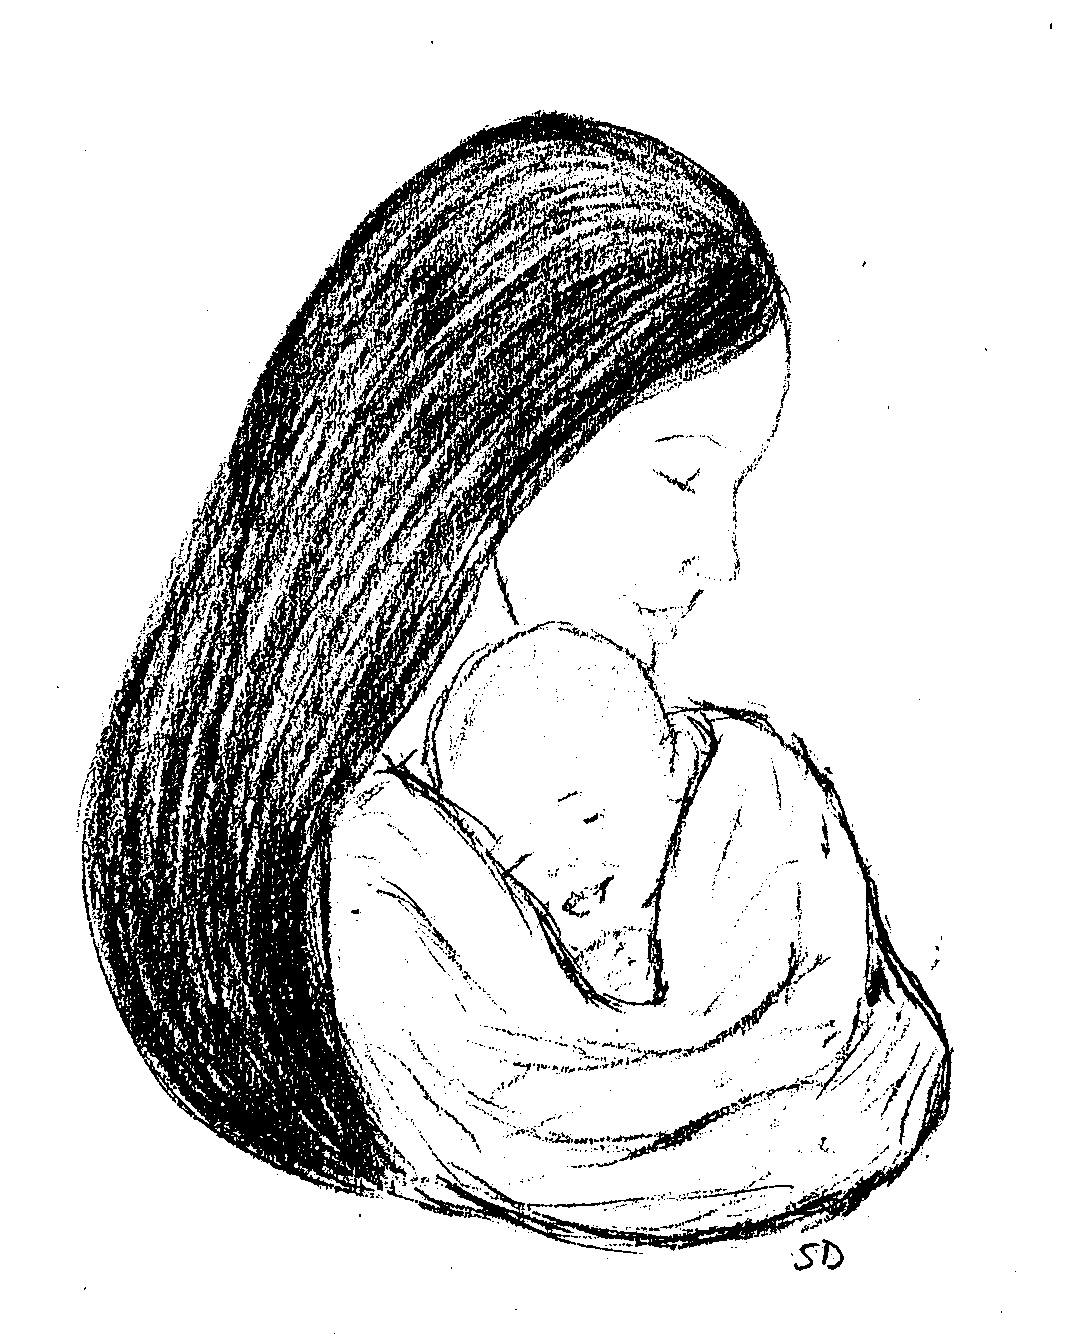 susan comforting baby essay Susan comforting the baby susan comforting the baby mary cassatt ca 1881 oil on canvas museum of fine arts, houston artist: mary cassatt details: ca 1881.